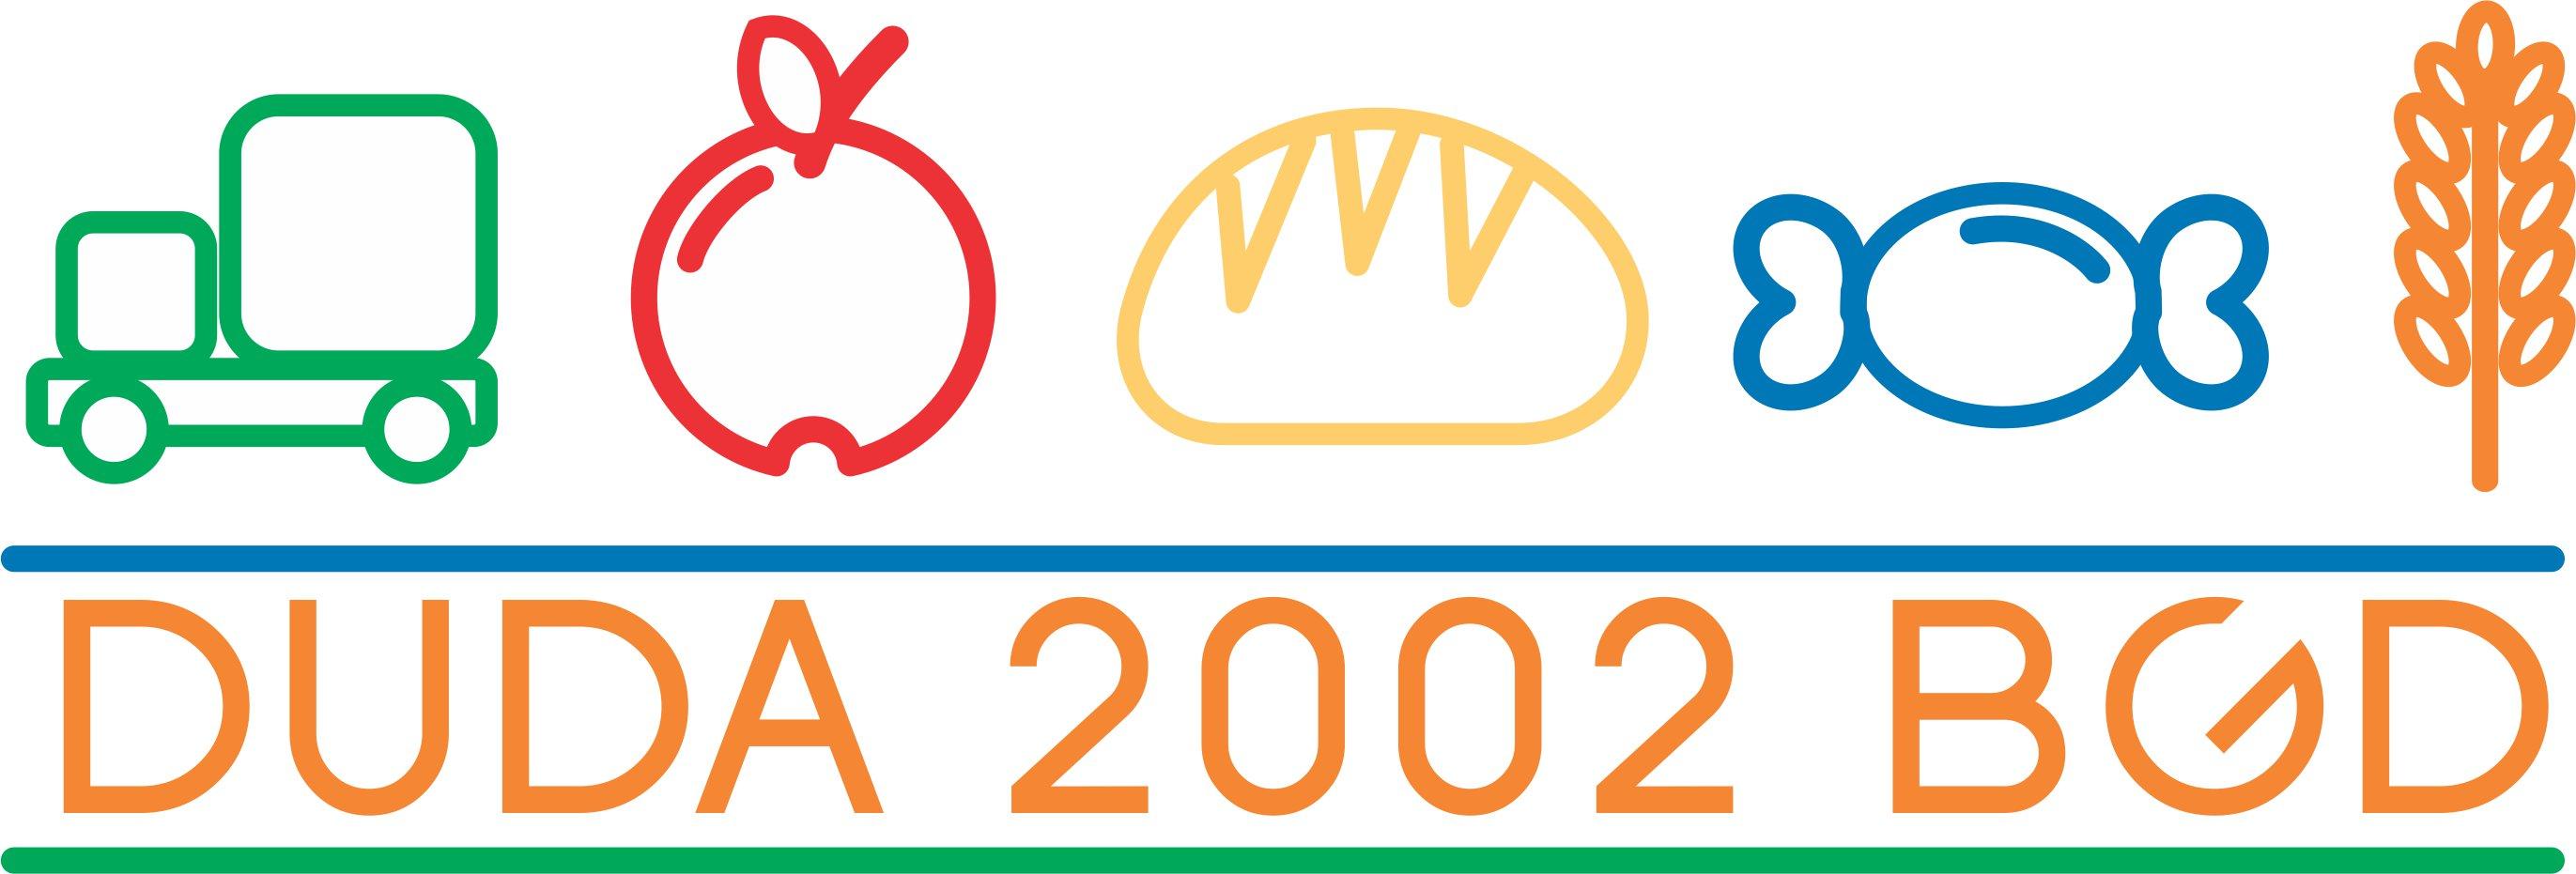 Duda 2002 Bgd